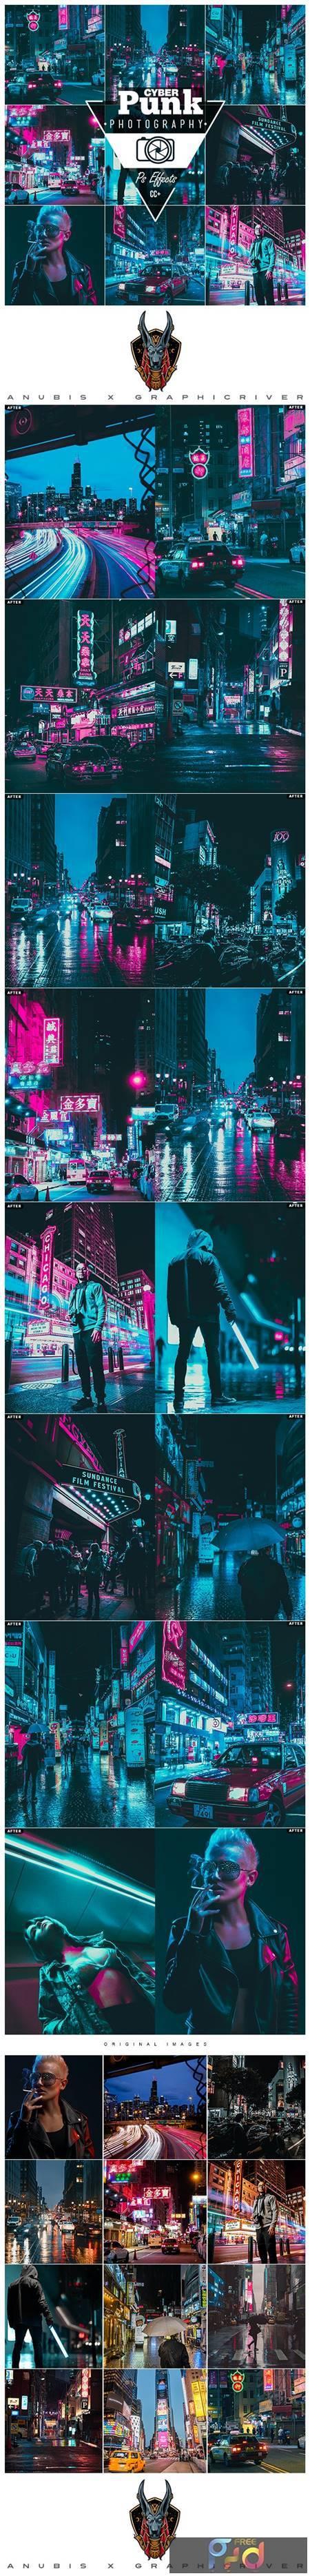 Cyberpunk Photoshop Action 26328763 1